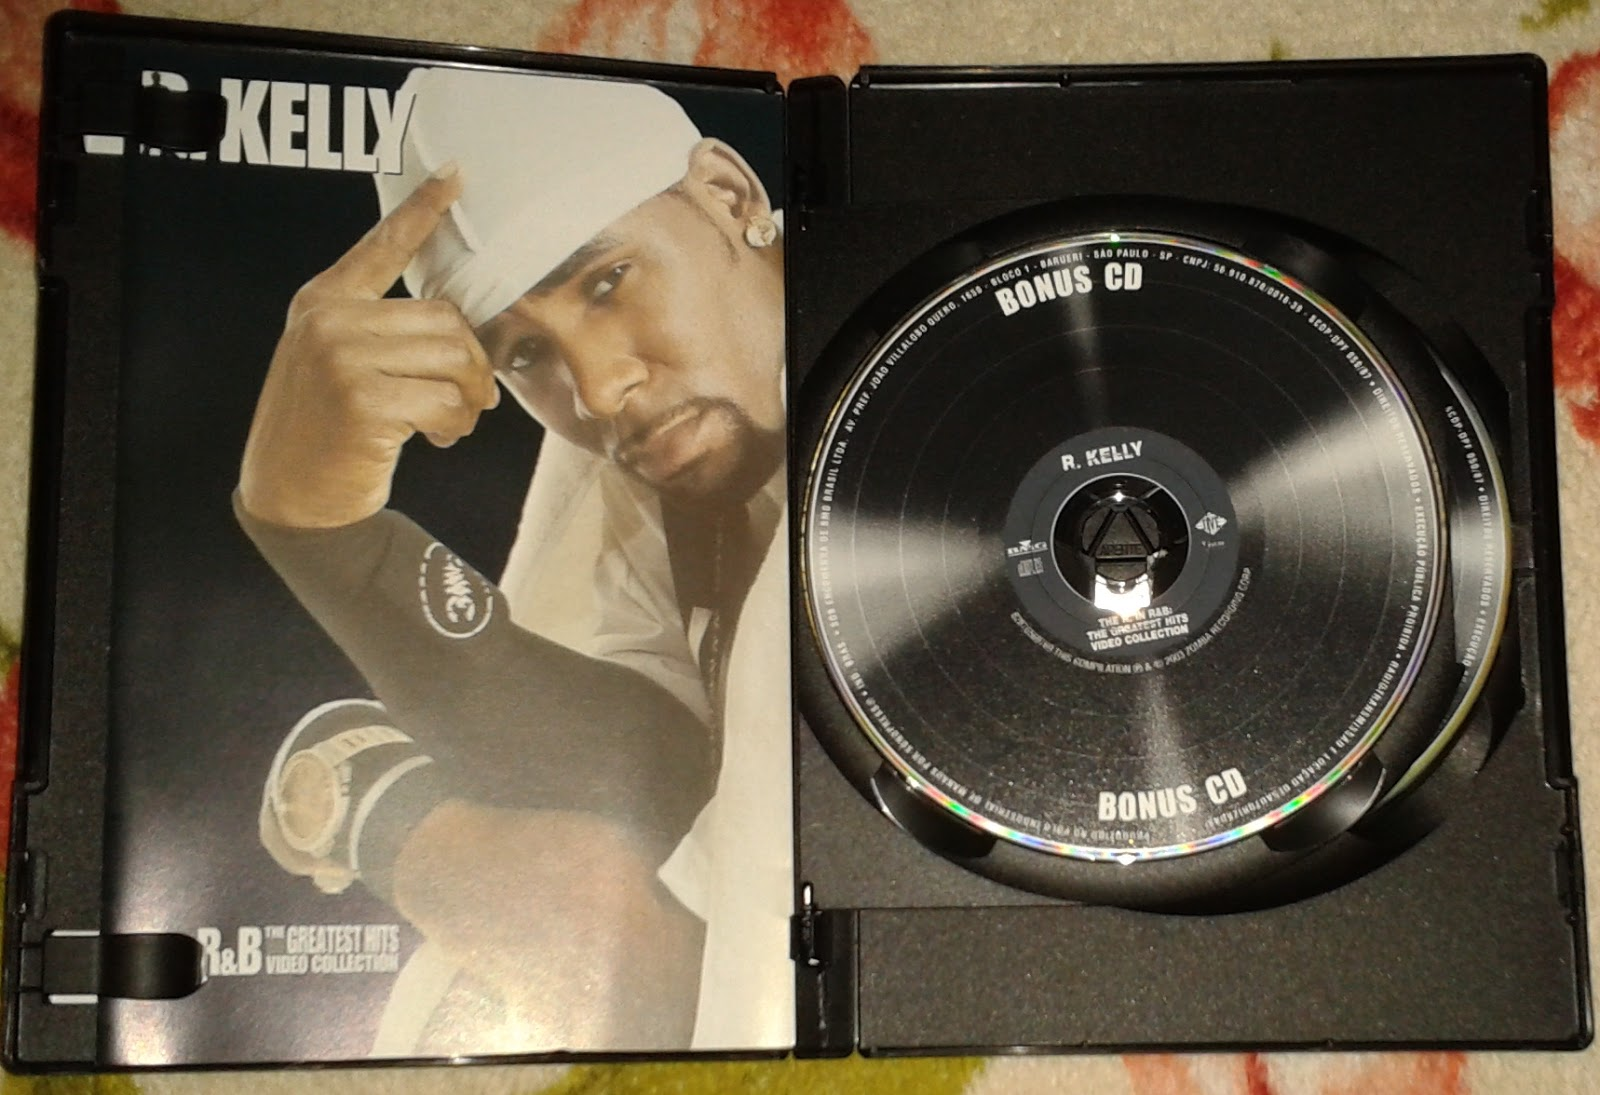 R. Kelly - Greatest Hits' 2000